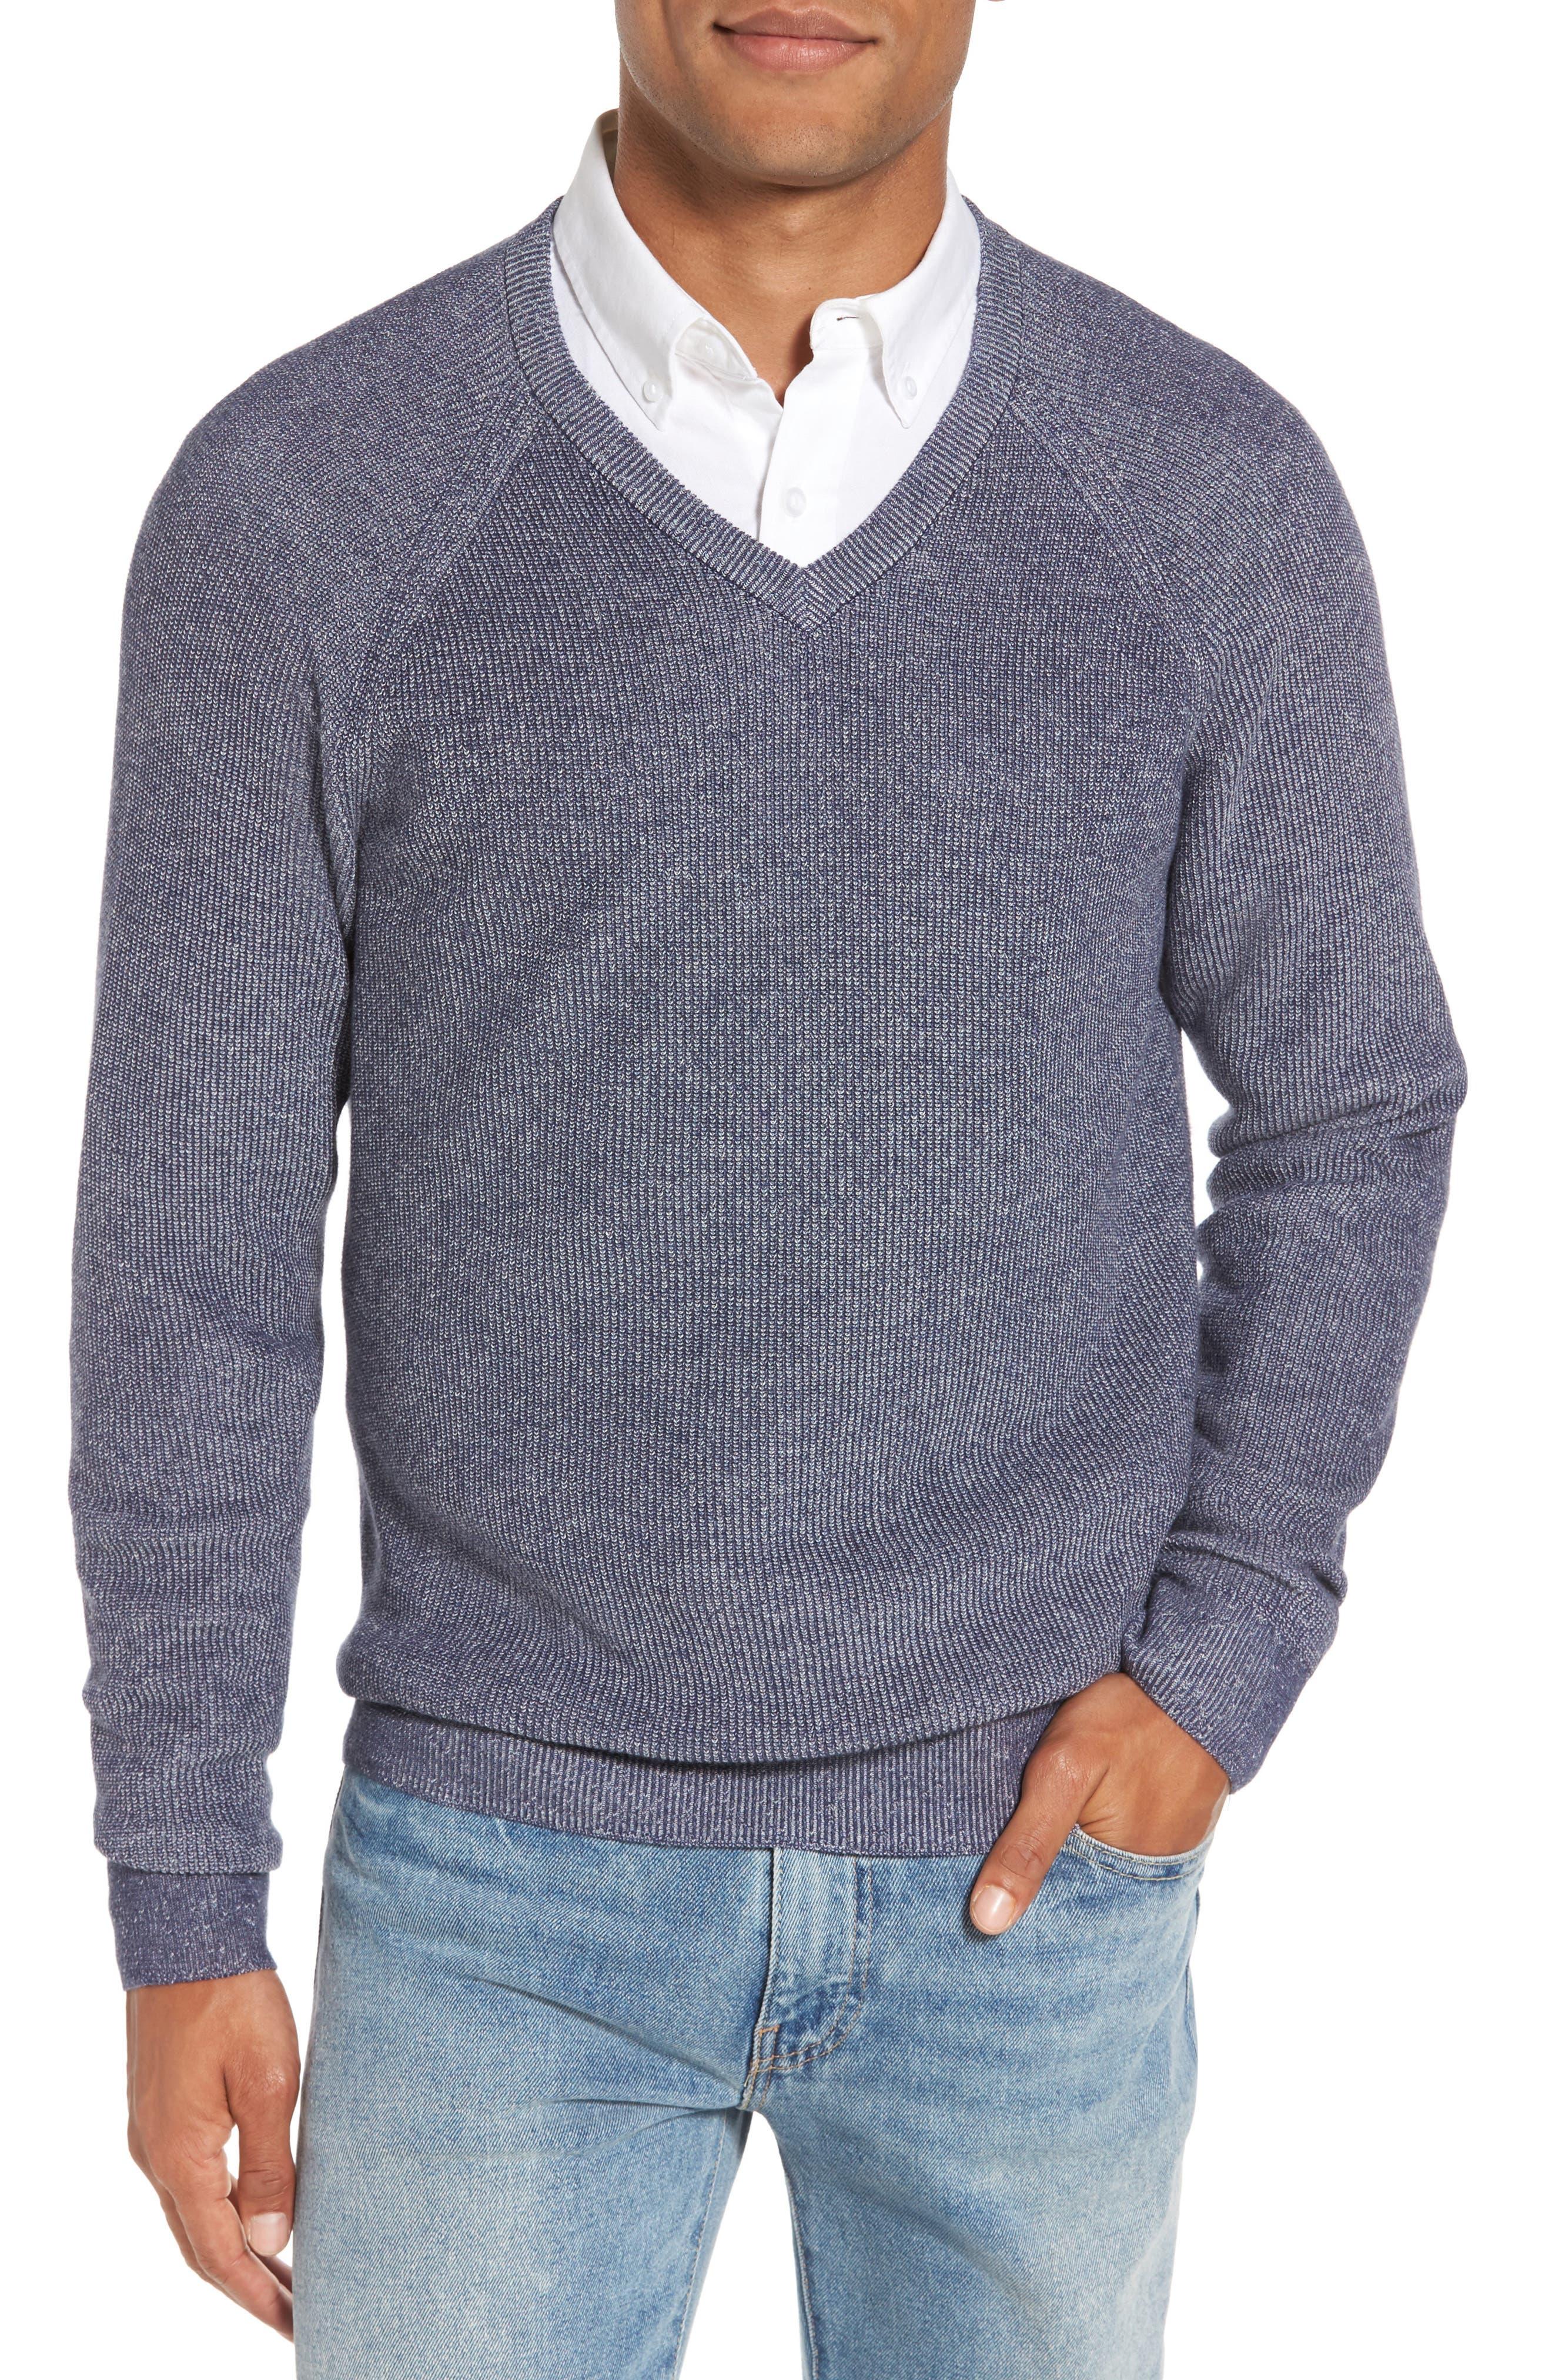 Alternate Image 1 Selected - Nordstrom Men's Shop Supima® Cotton V-Neck Sweater